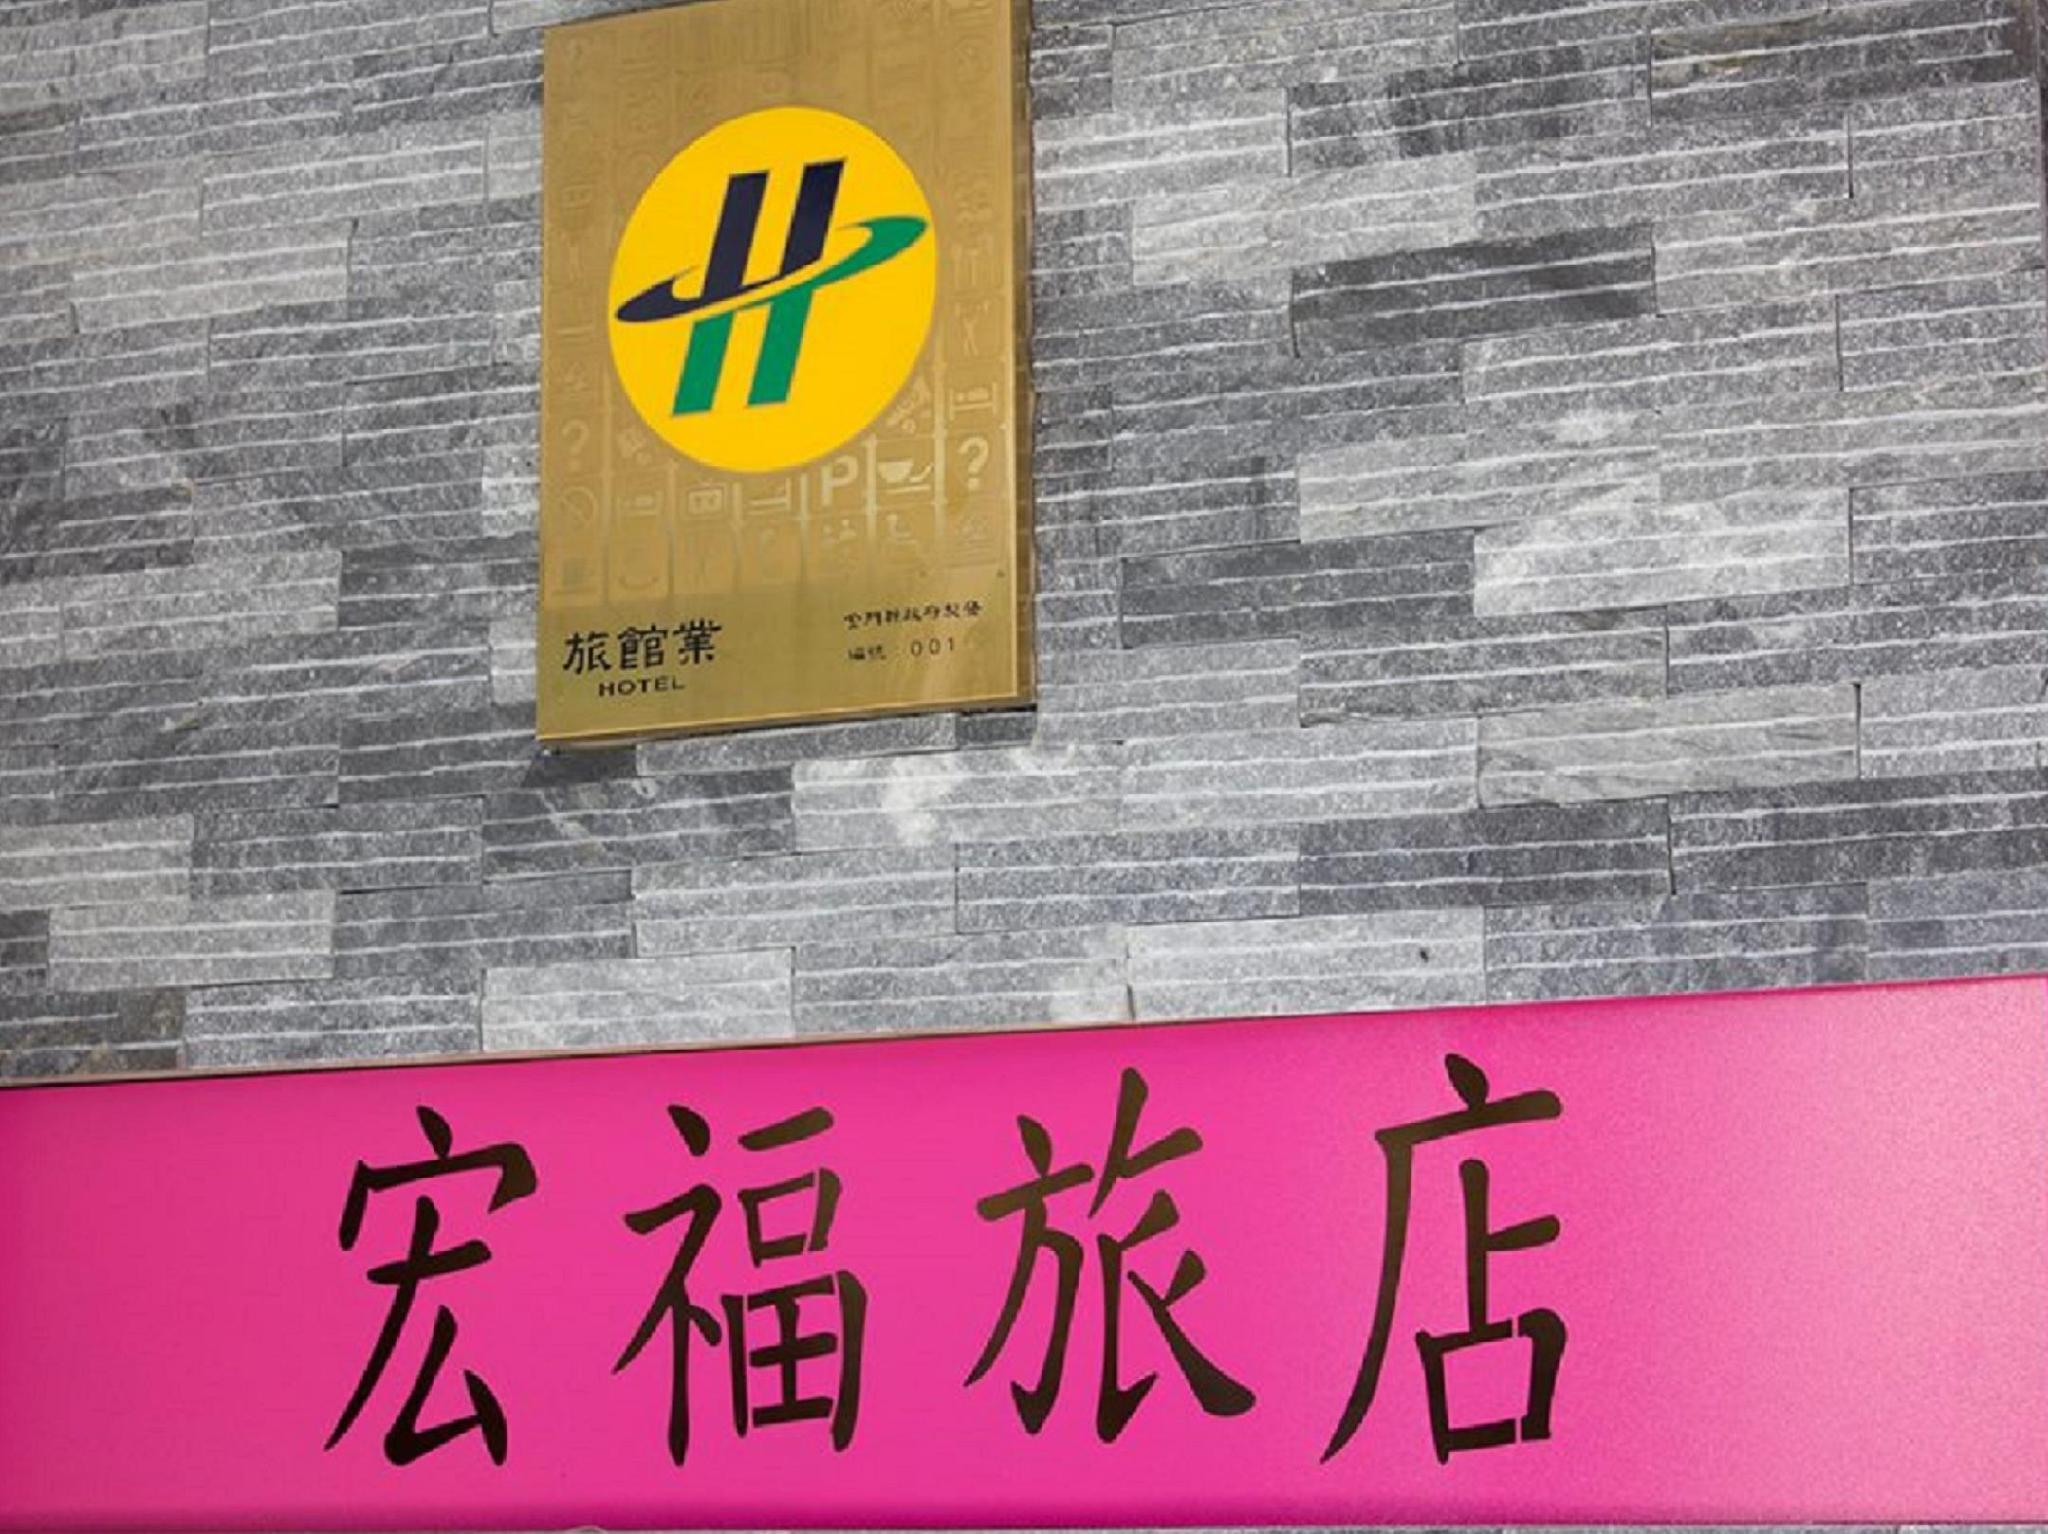 宏福旅店 Home Full Hotel